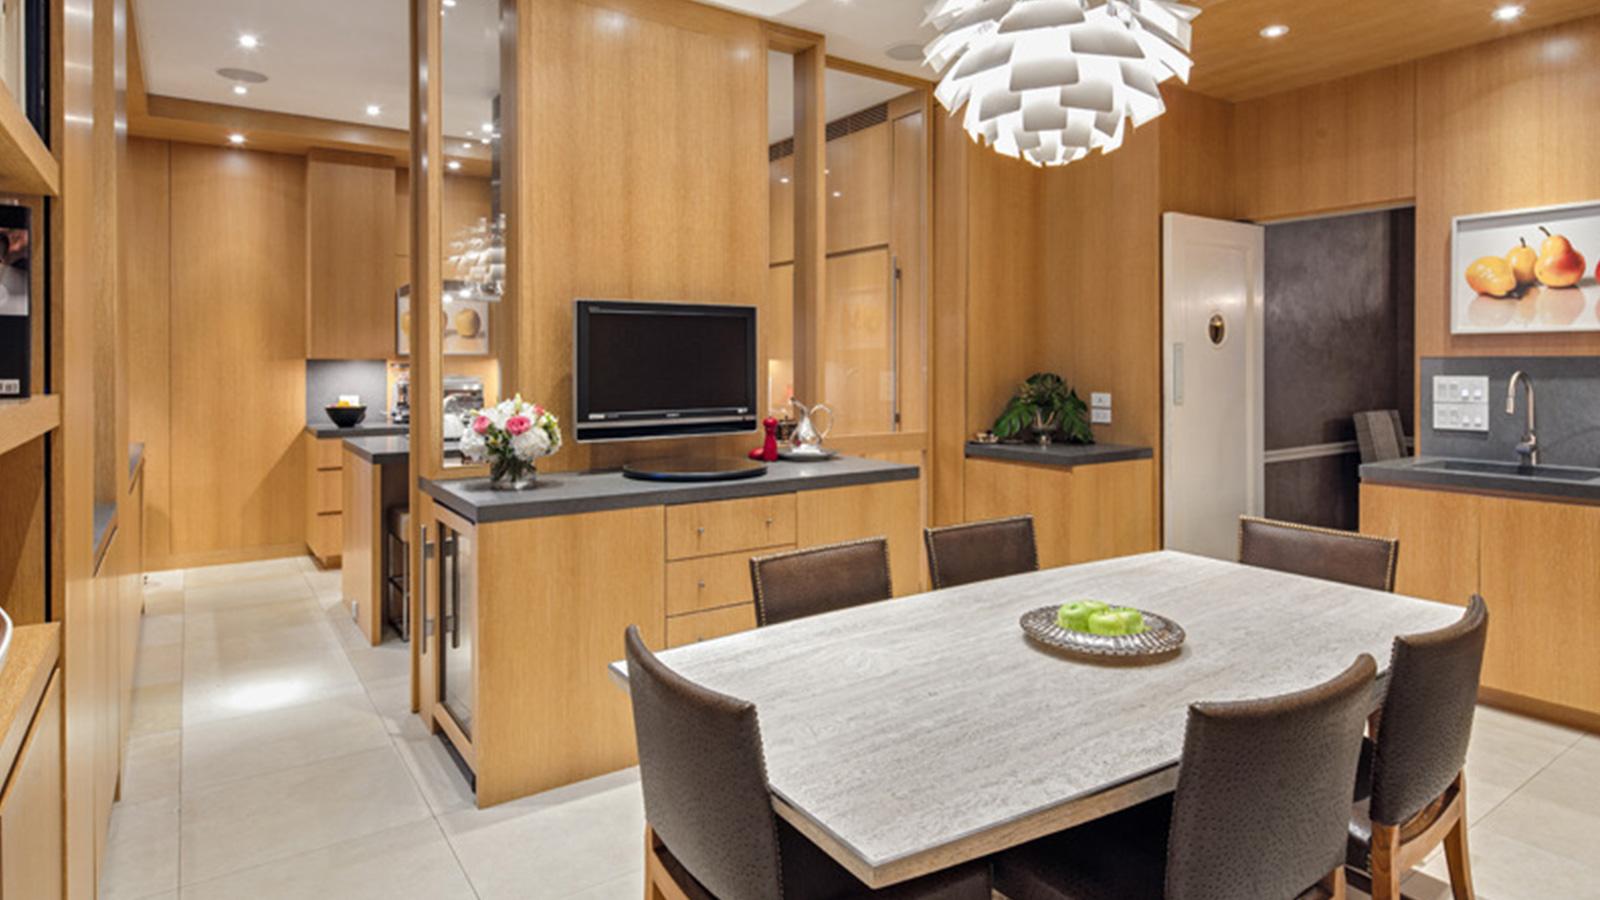 775 Park Avenue Nyc Apartments Cityrealty